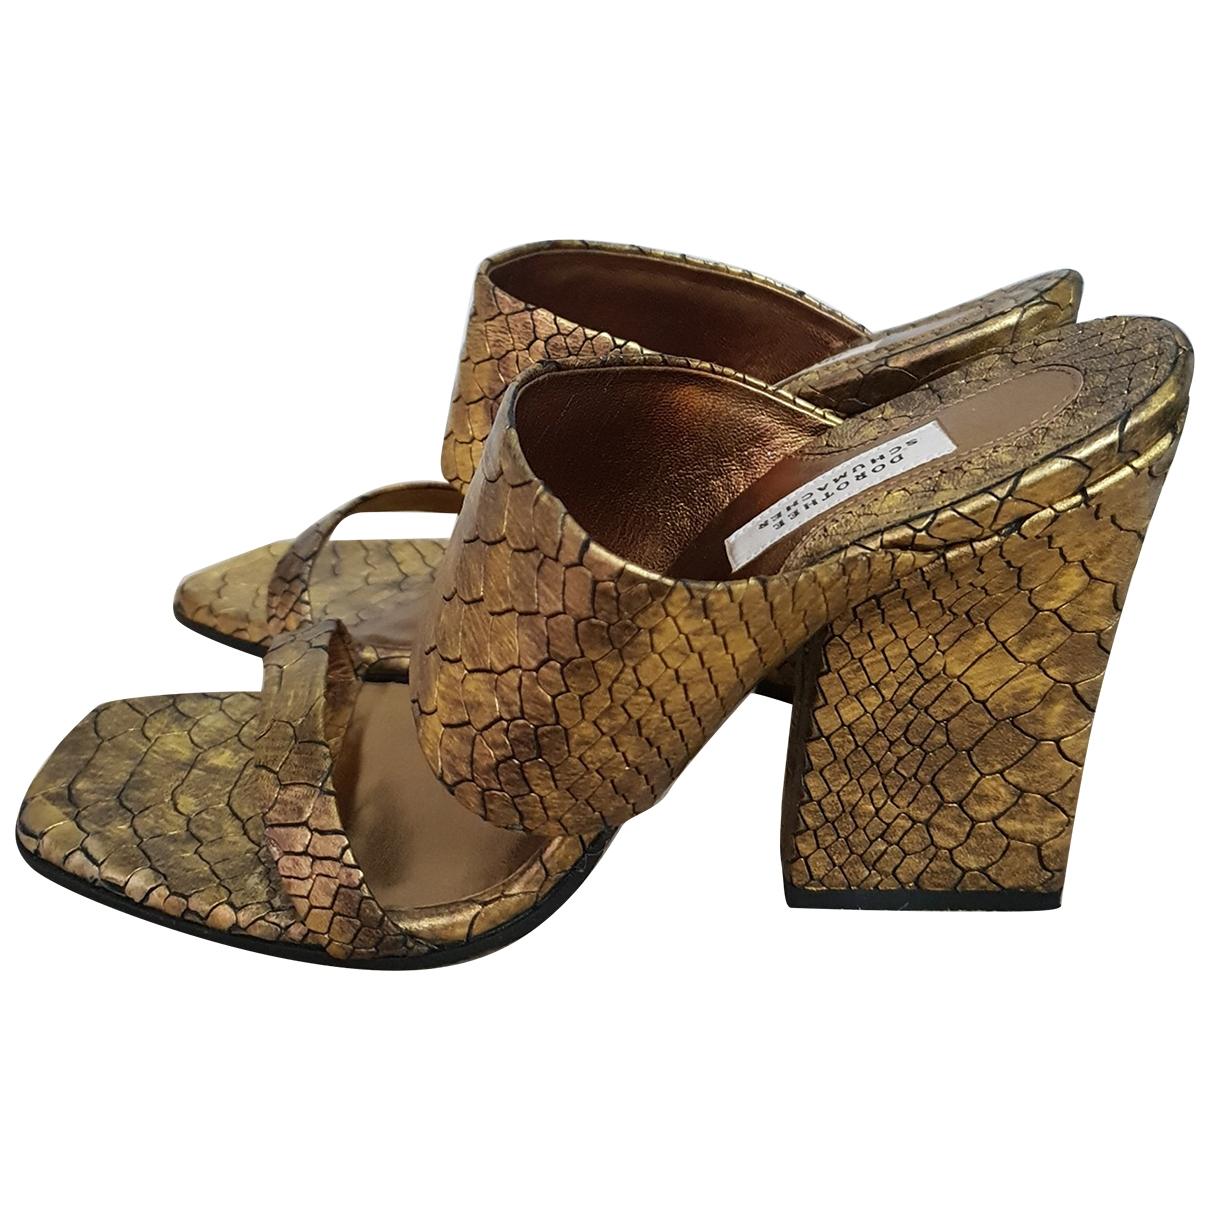 Dorothee Schumacher \N Gold Leather Heels for Women 37.5 EU